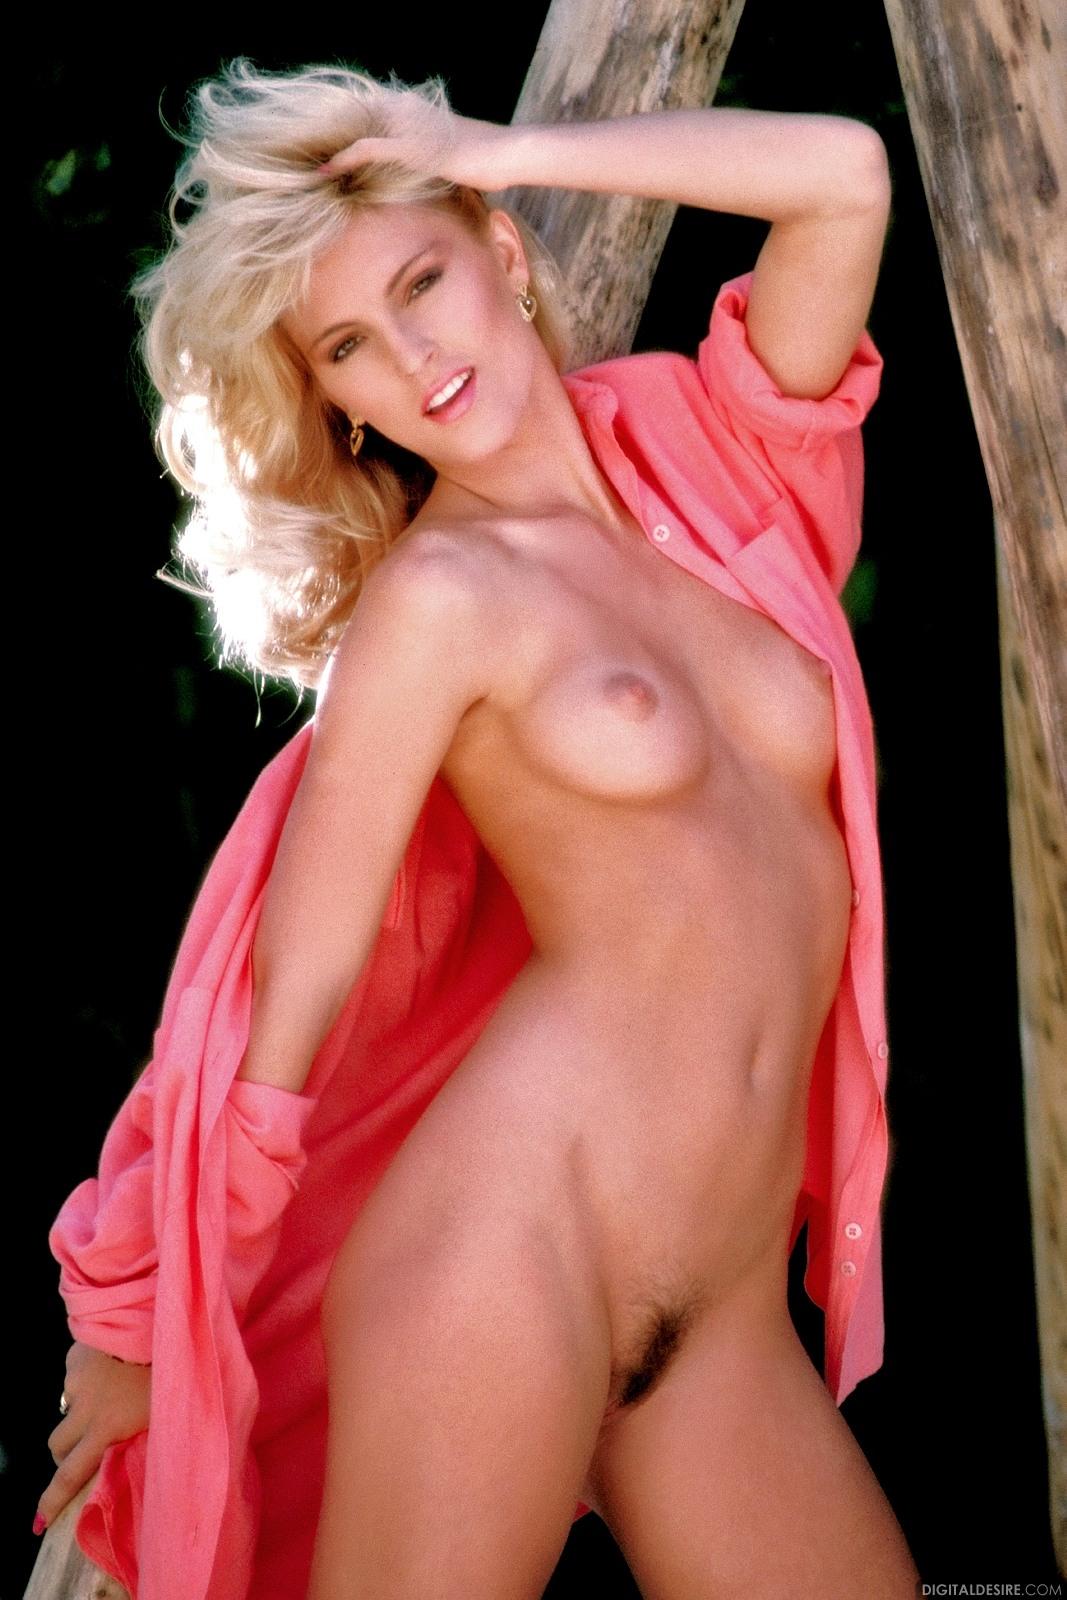 90s nudes